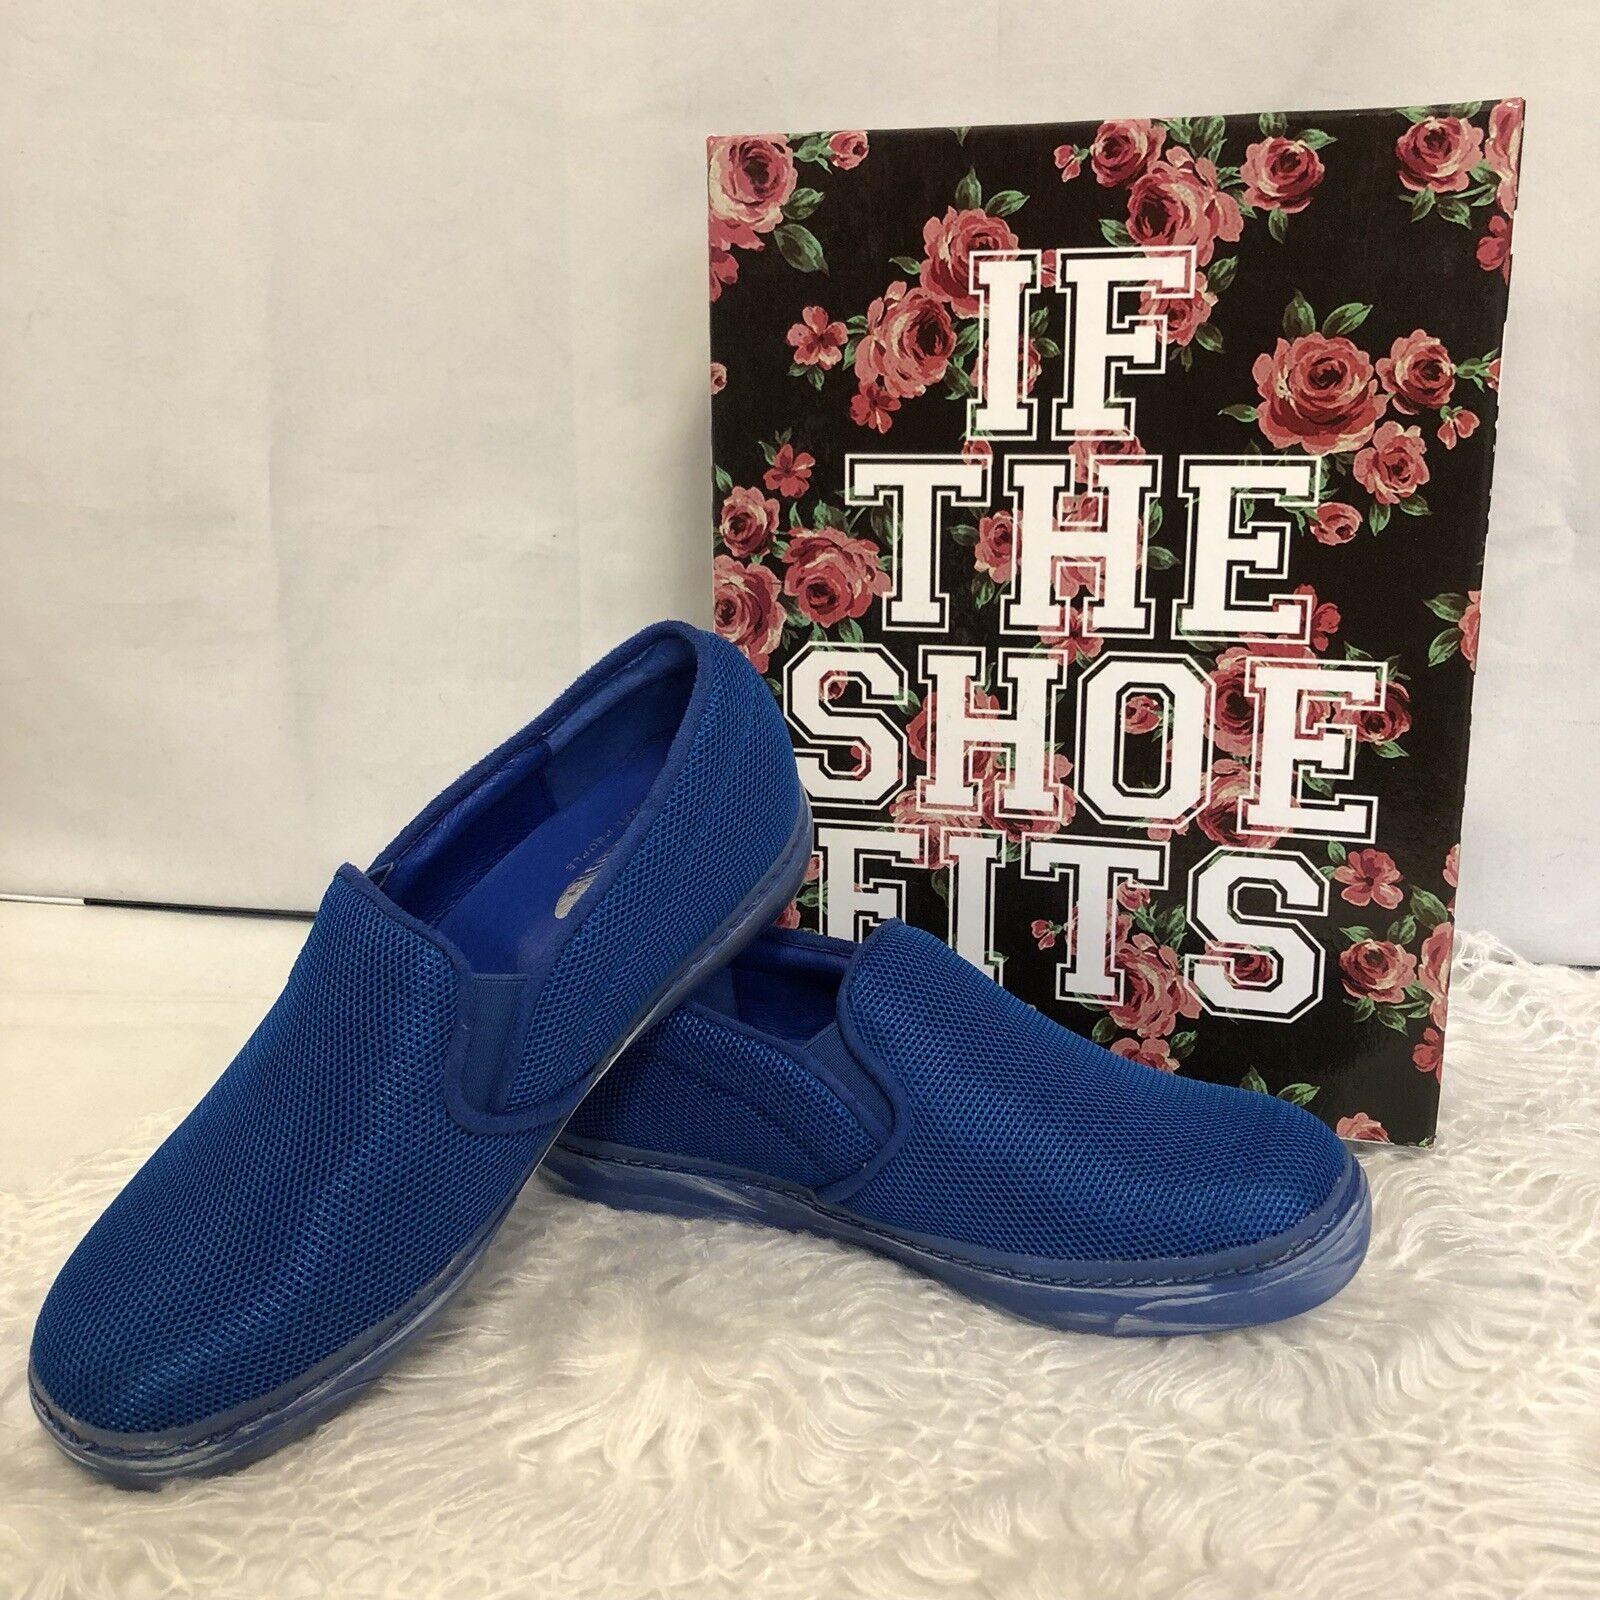 110 NEW Jeffrey Campbell X FREE PEOPLE Slip On Eltan Sneakers Size 8 Mesh bluee